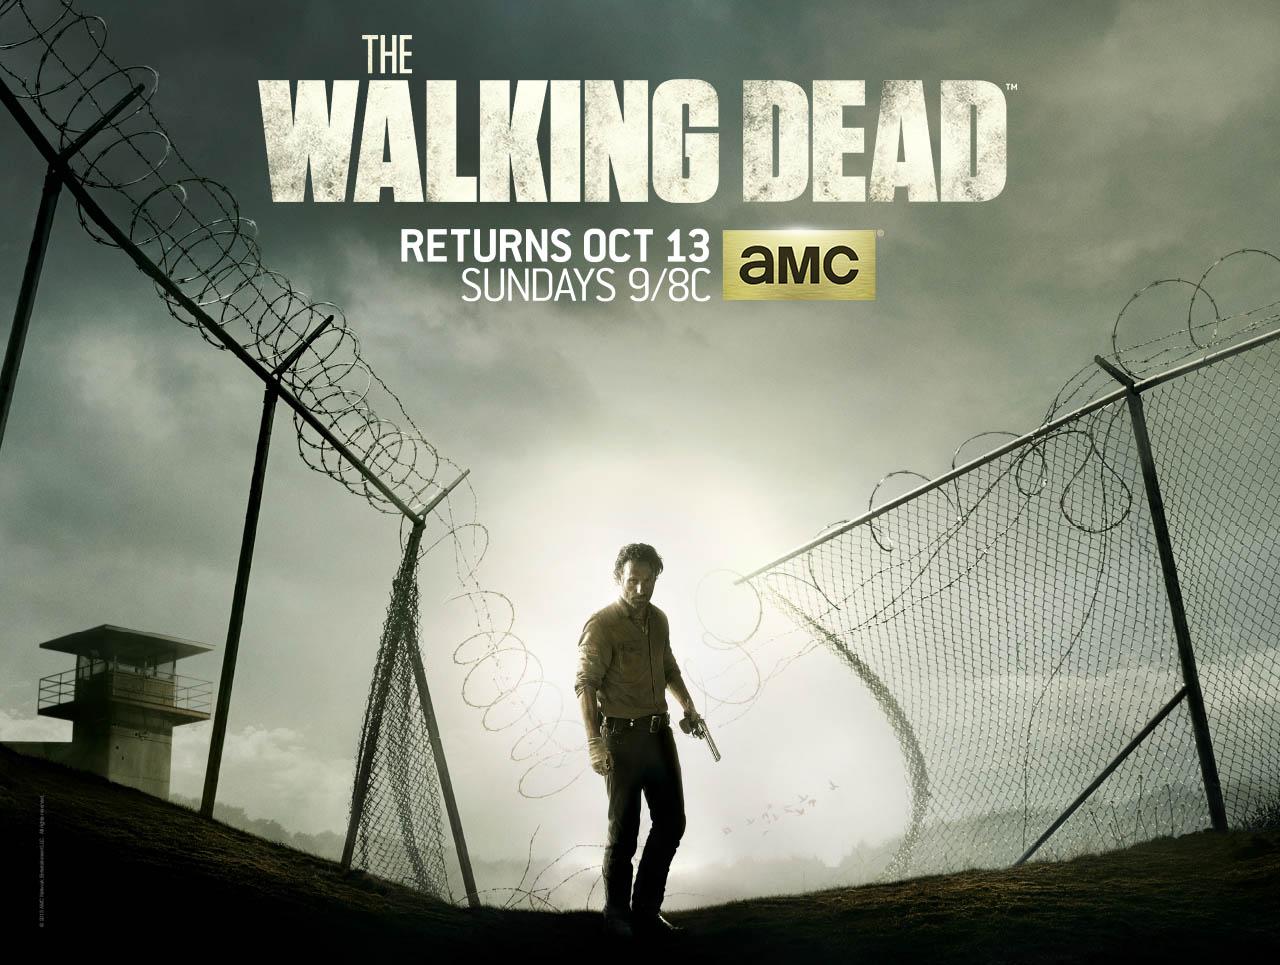 blogs the walking dead the walking dead season 4 poster revealed amc. Black Bedroom Furniture Sets. Home Design Ideas